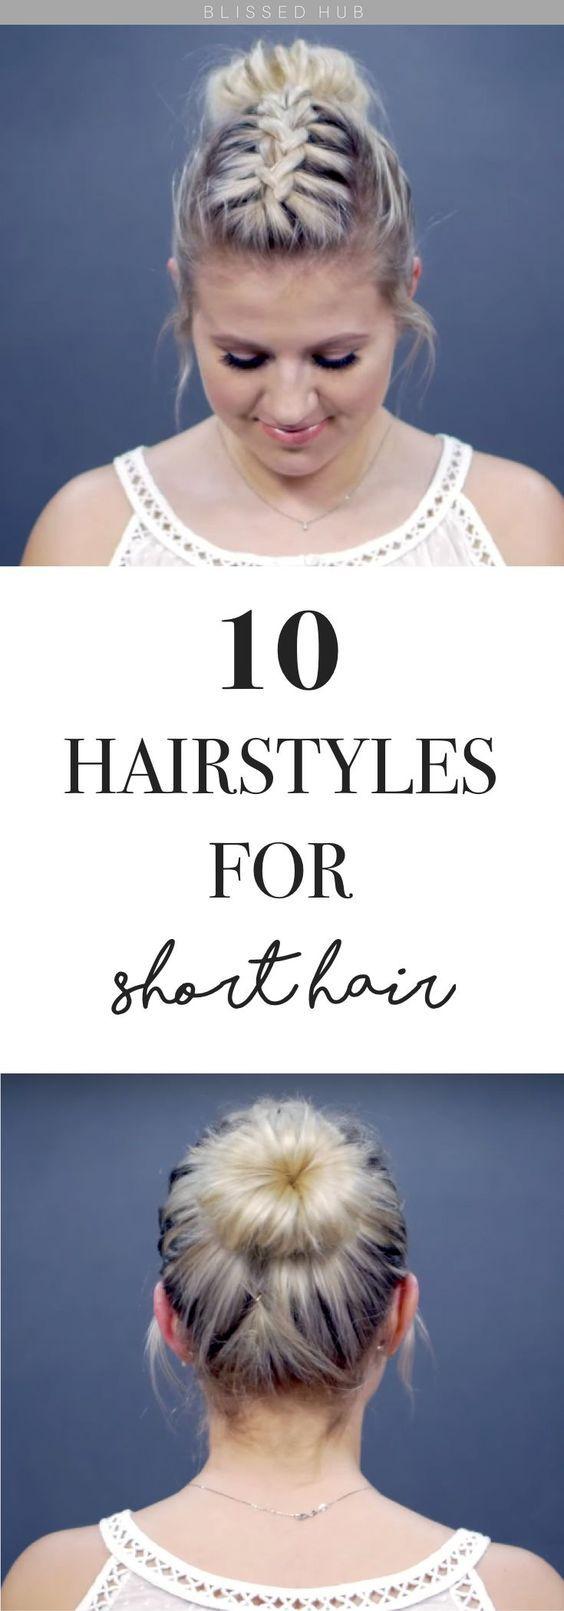 10 Different Hairstyles for Short Hair: Bun Edition | Cute ...